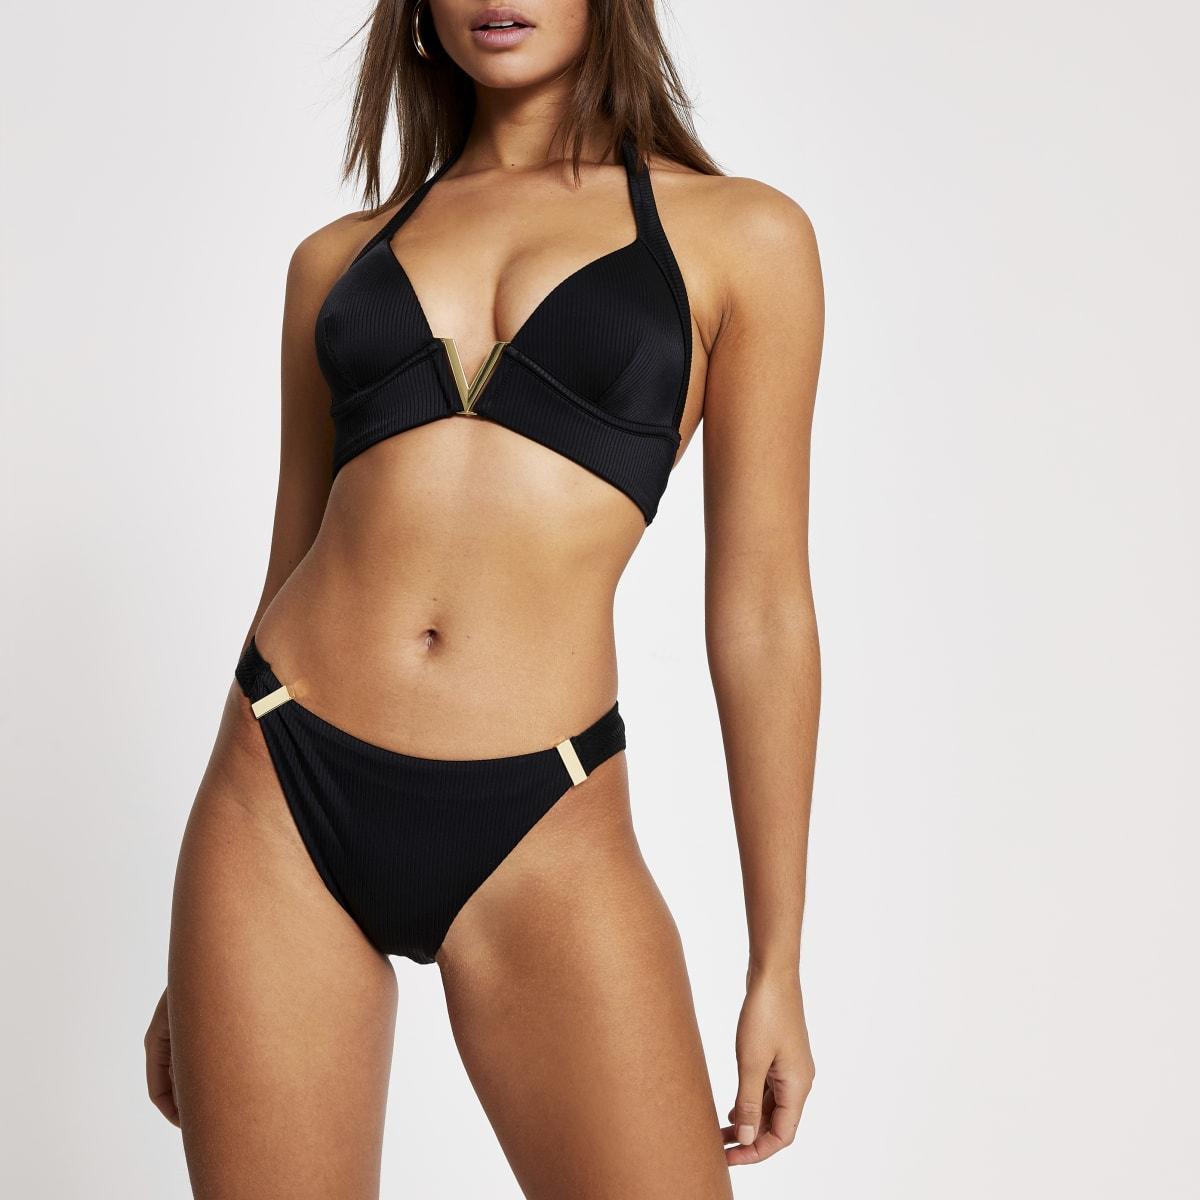 Bas de bikini échancrécôtelénoir